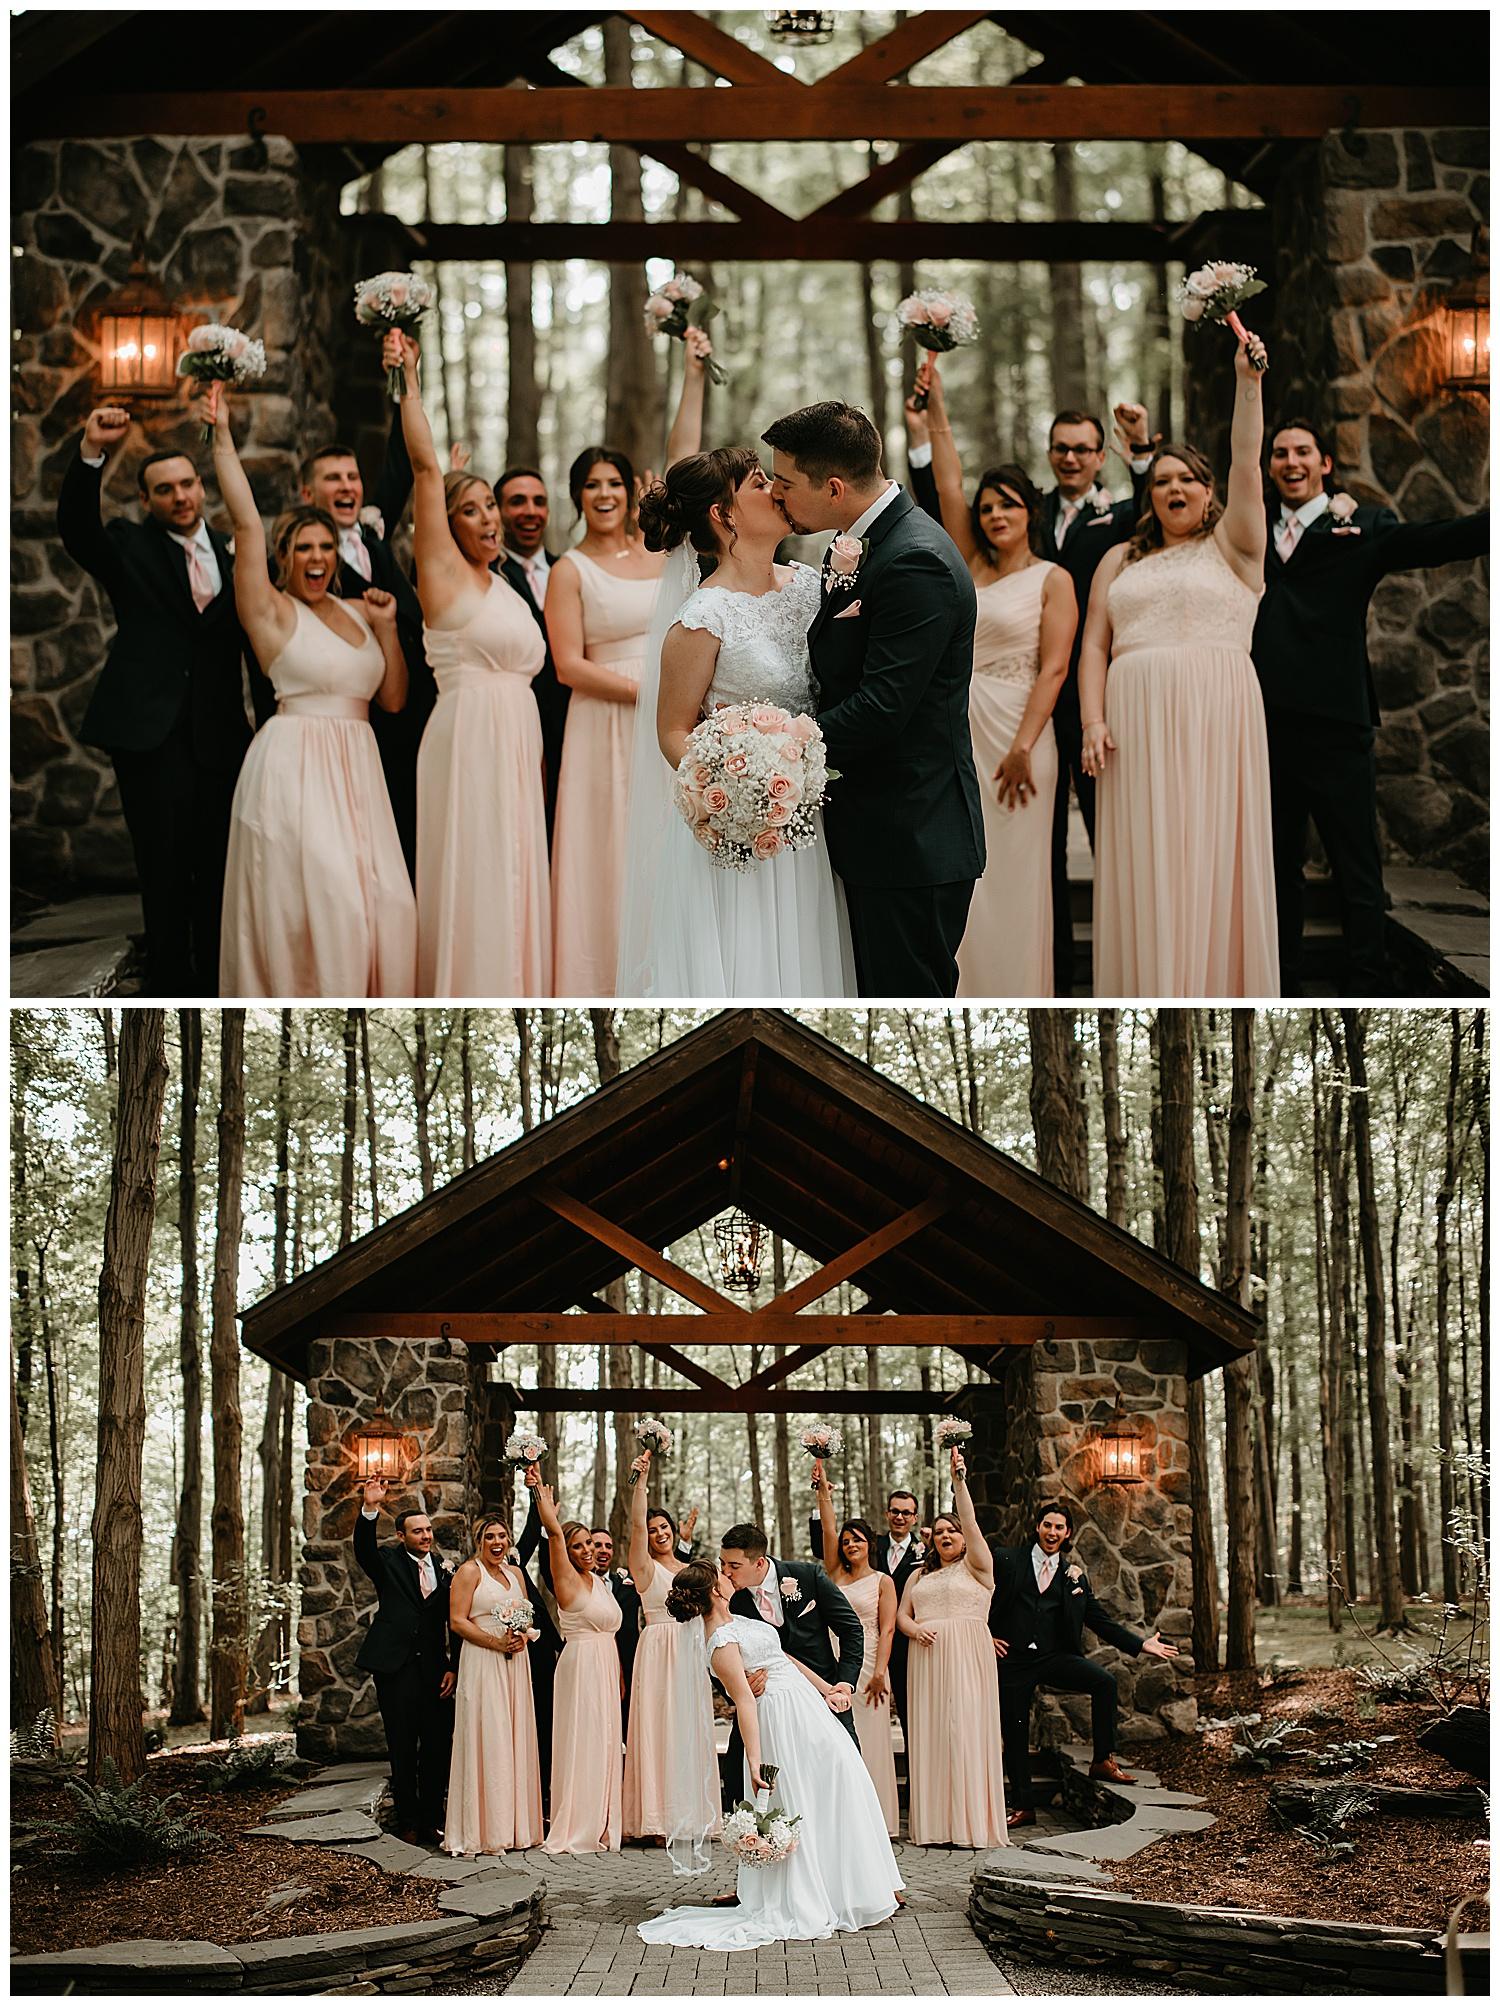 NEPA-Mount-Pocono-Wedding-Photographer-at-the-Stroudsmoor-Country-Inn-Stroudsburg-PA_0042.jpg